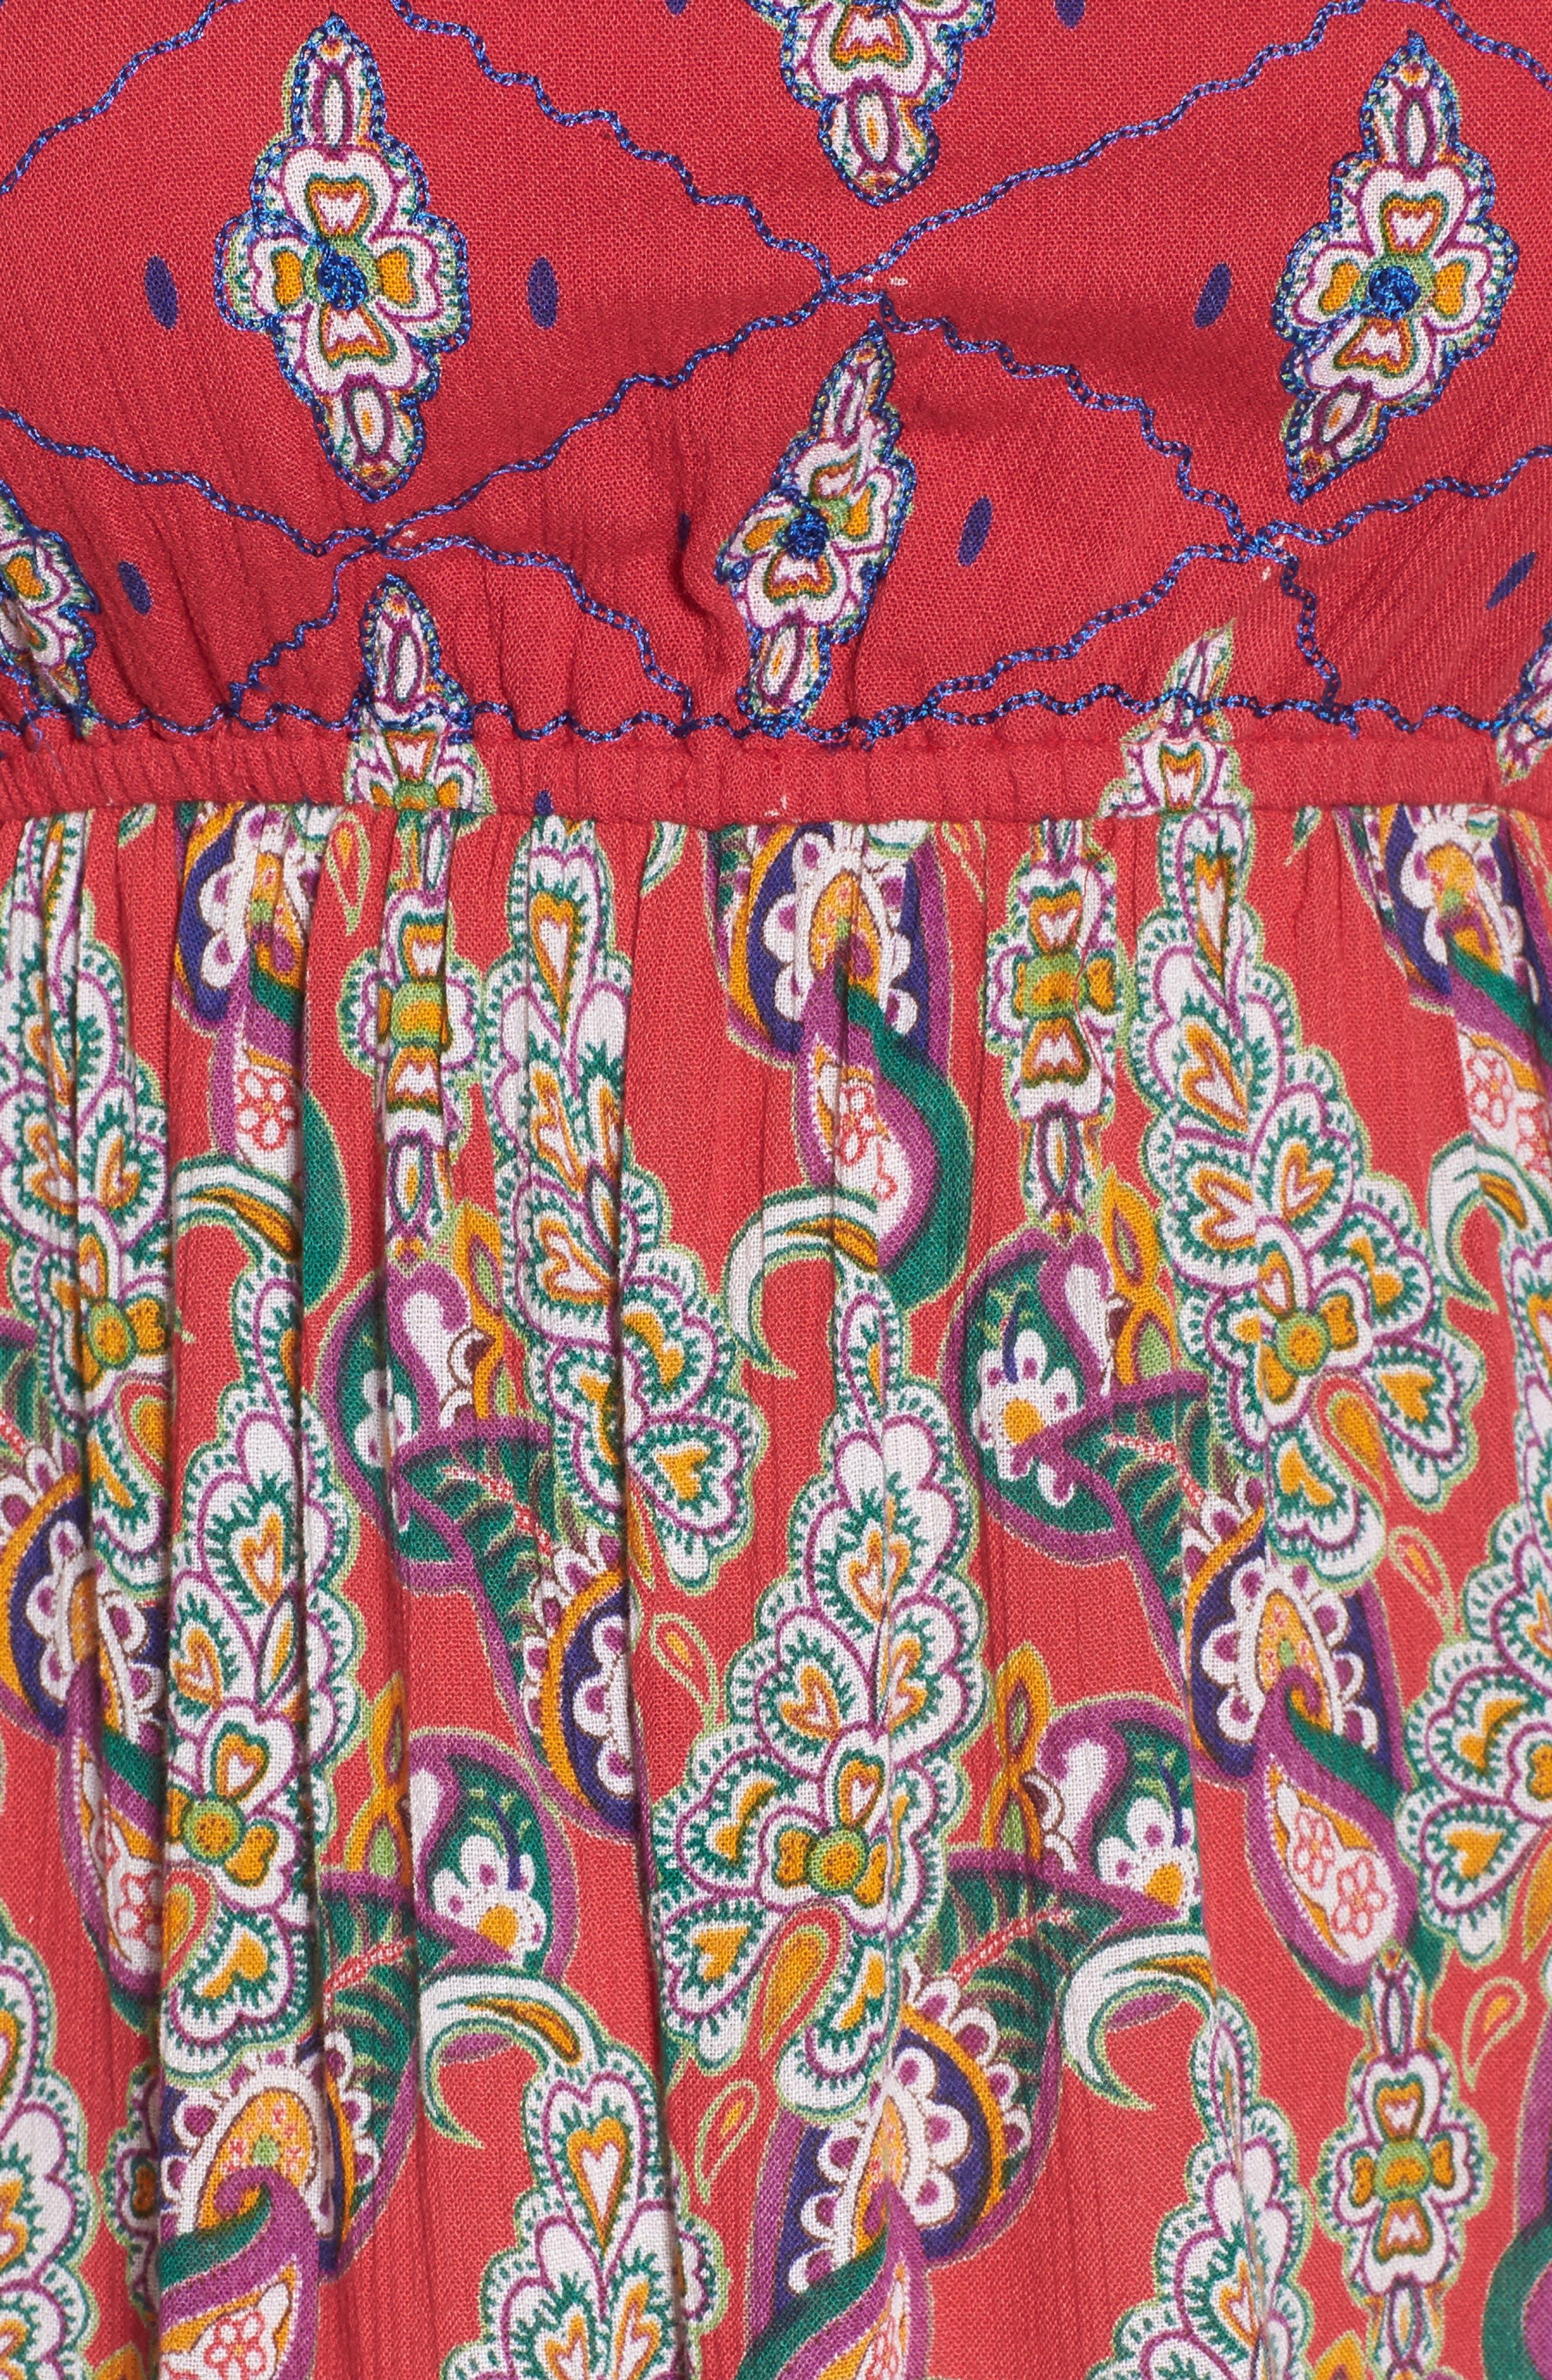 Alice Bell Sleeve Babydoll Dress,                             Alternate thumbnail 5, color,                             645